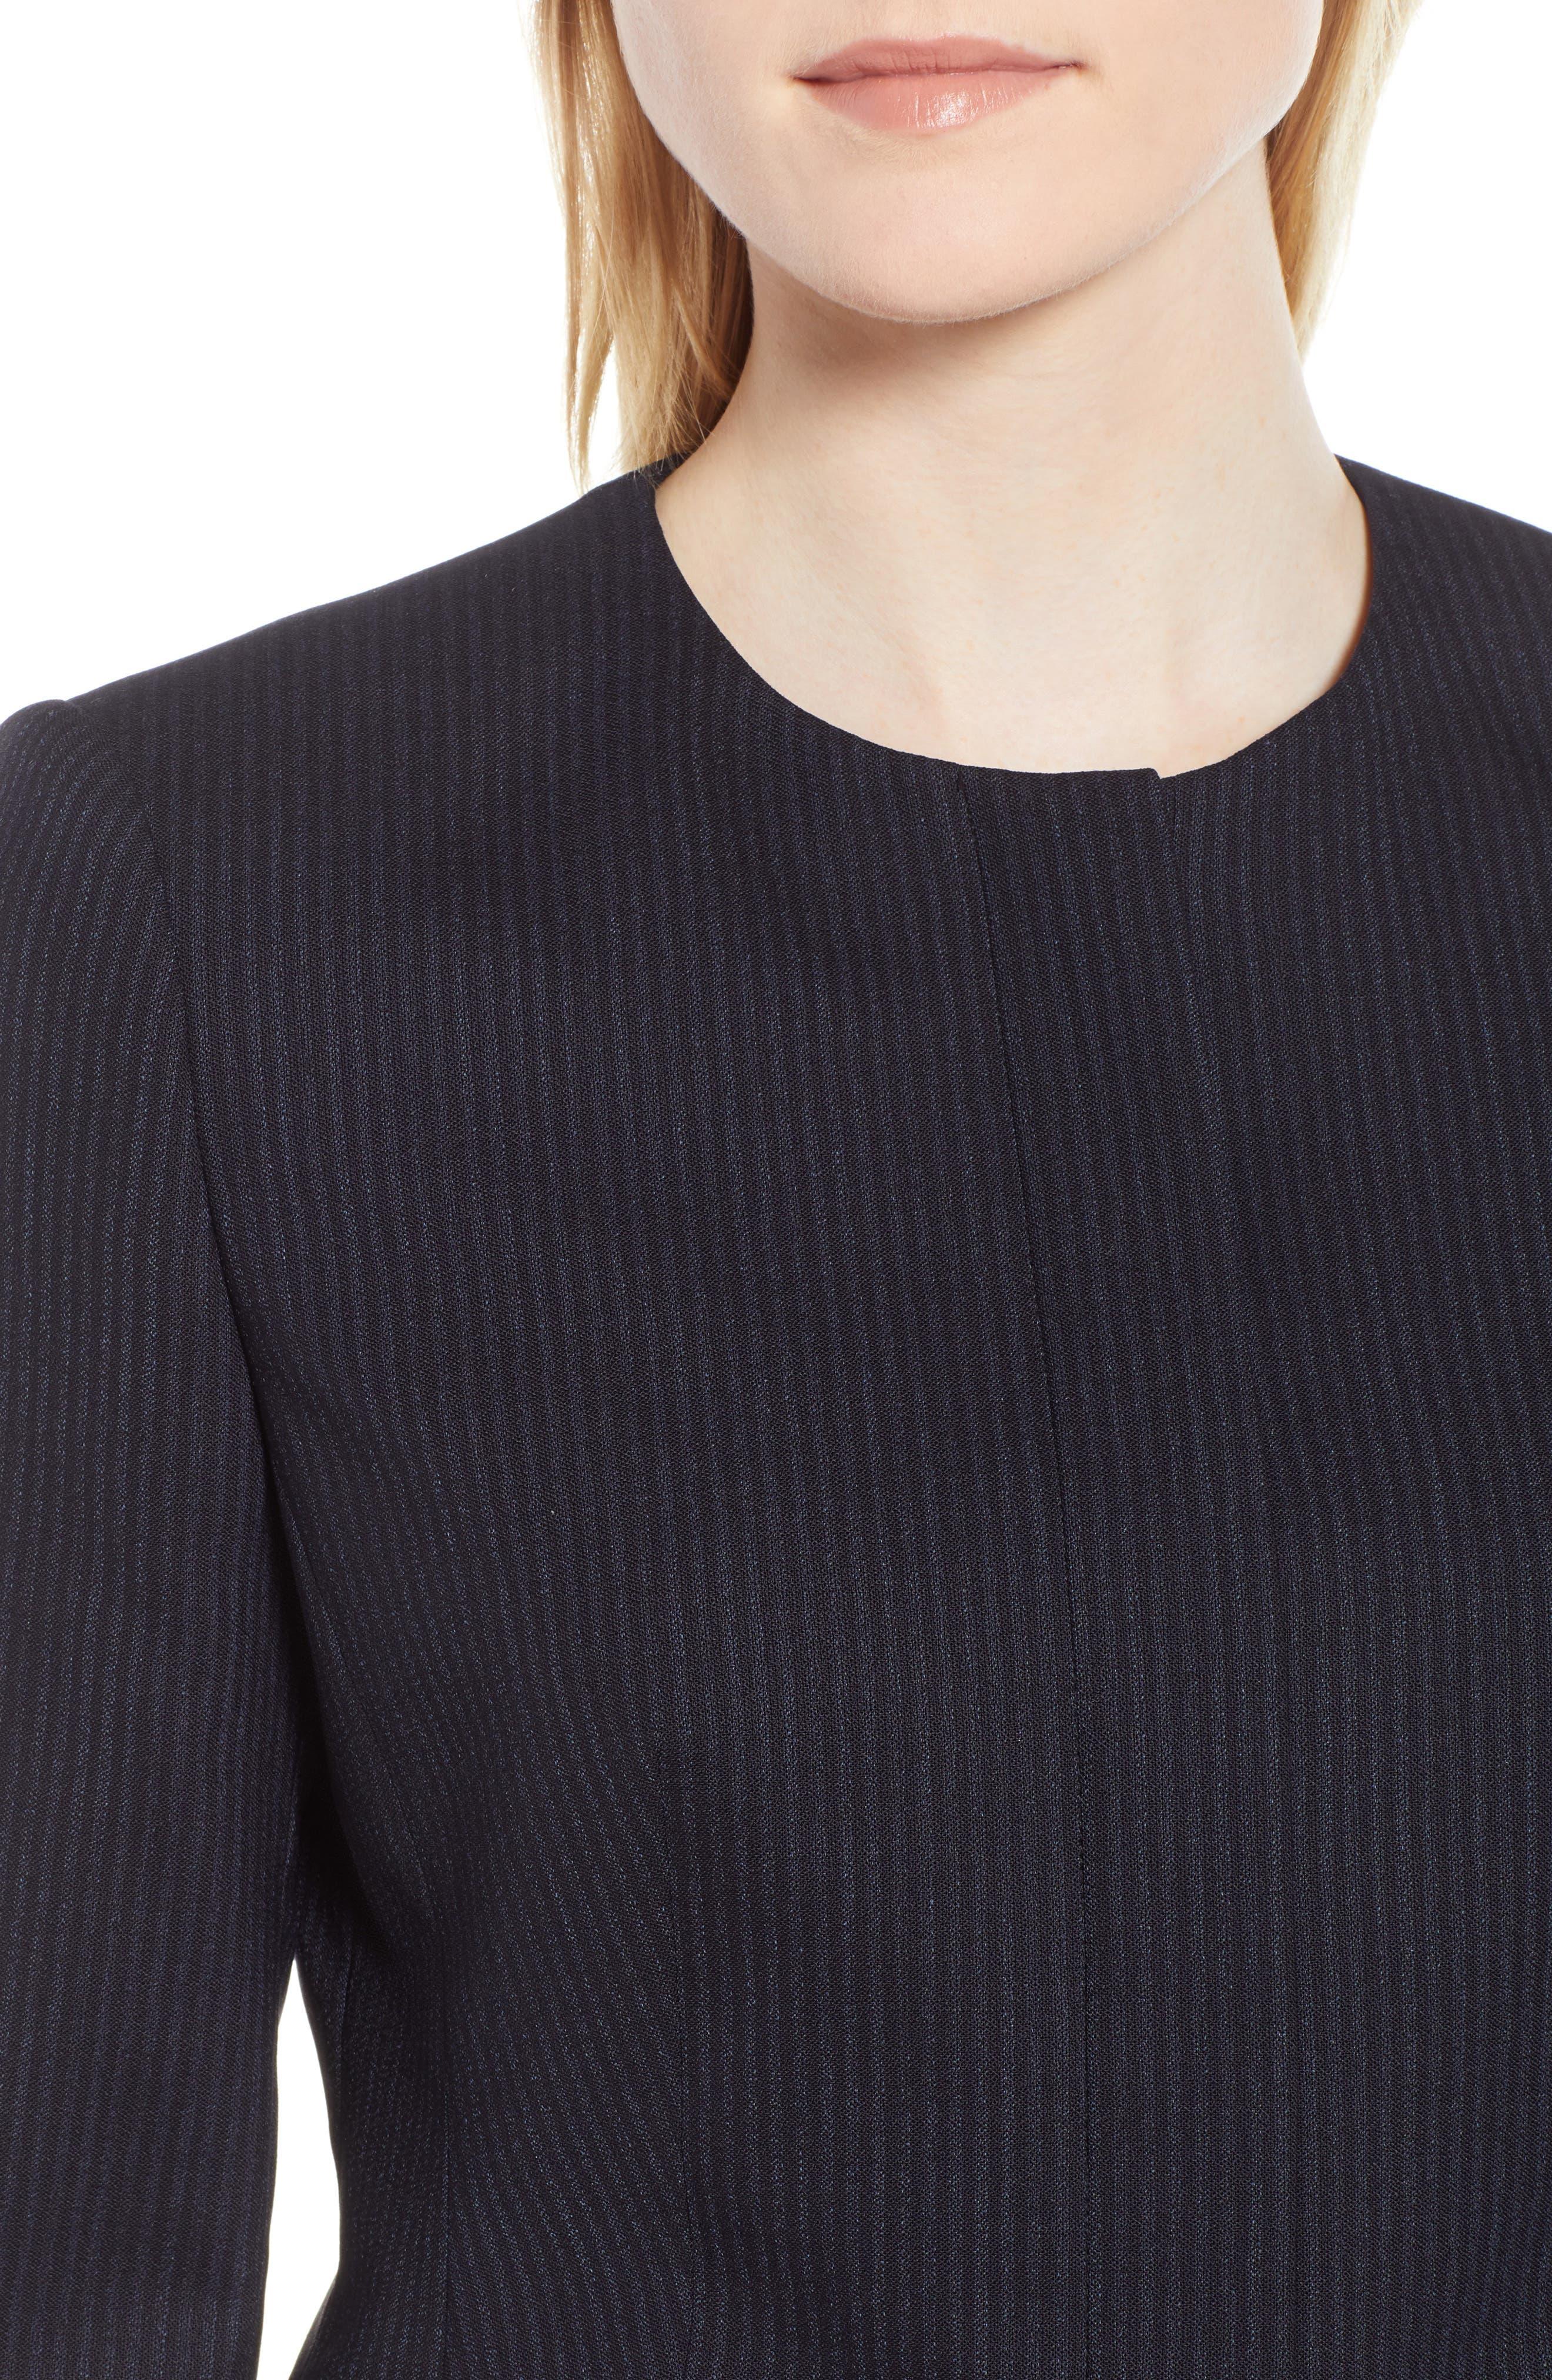 Jasyma Tonal Stripe Stretch Wool Suit Jacket,                             Alternate thumbnail 4, color,                             NAVY FANTASY